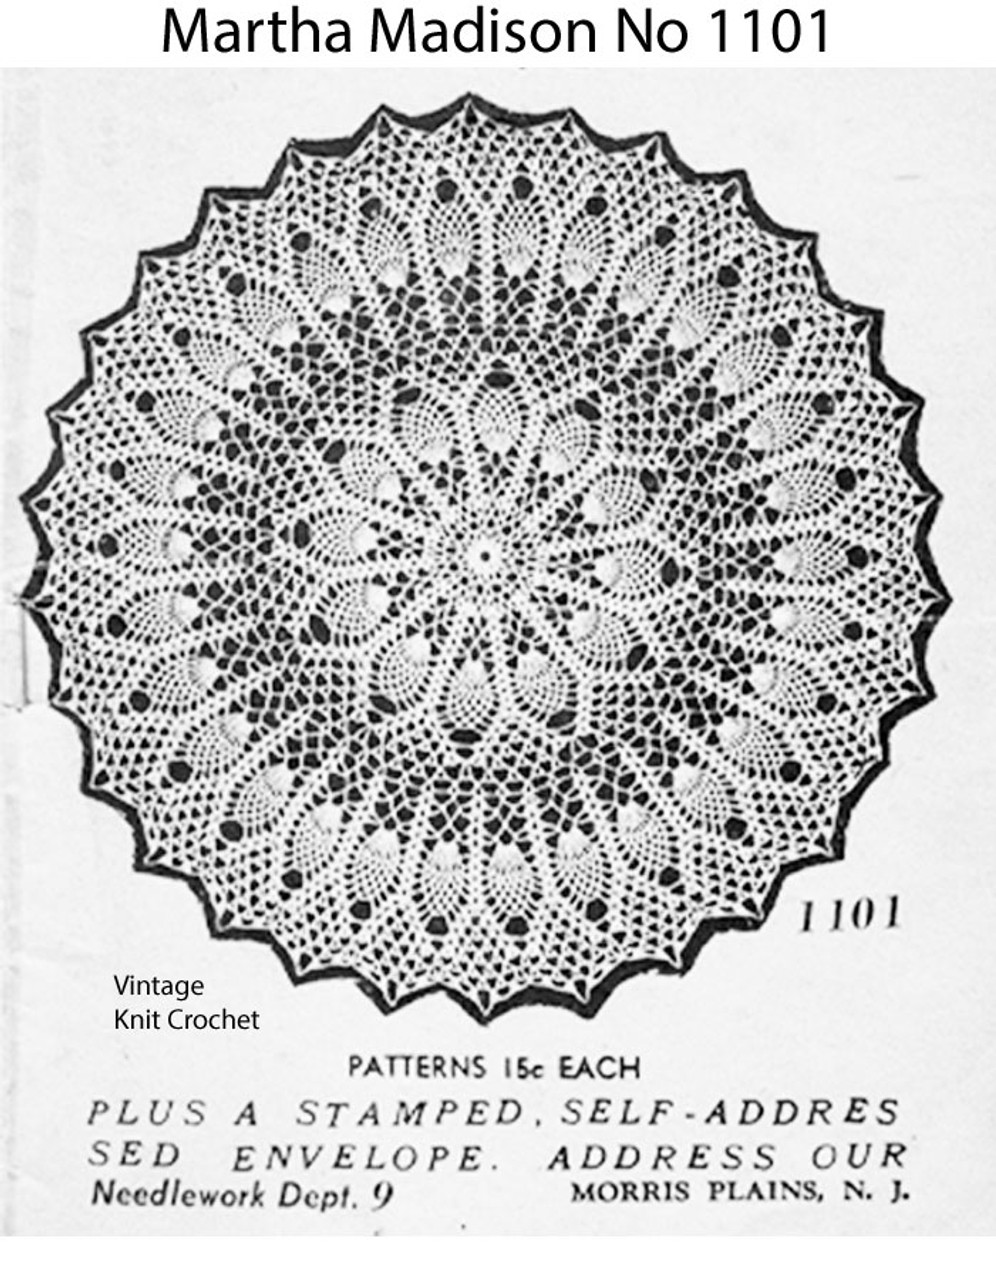 Crochet Gem Centerpiece Doily Pattern, Mail Order 1101